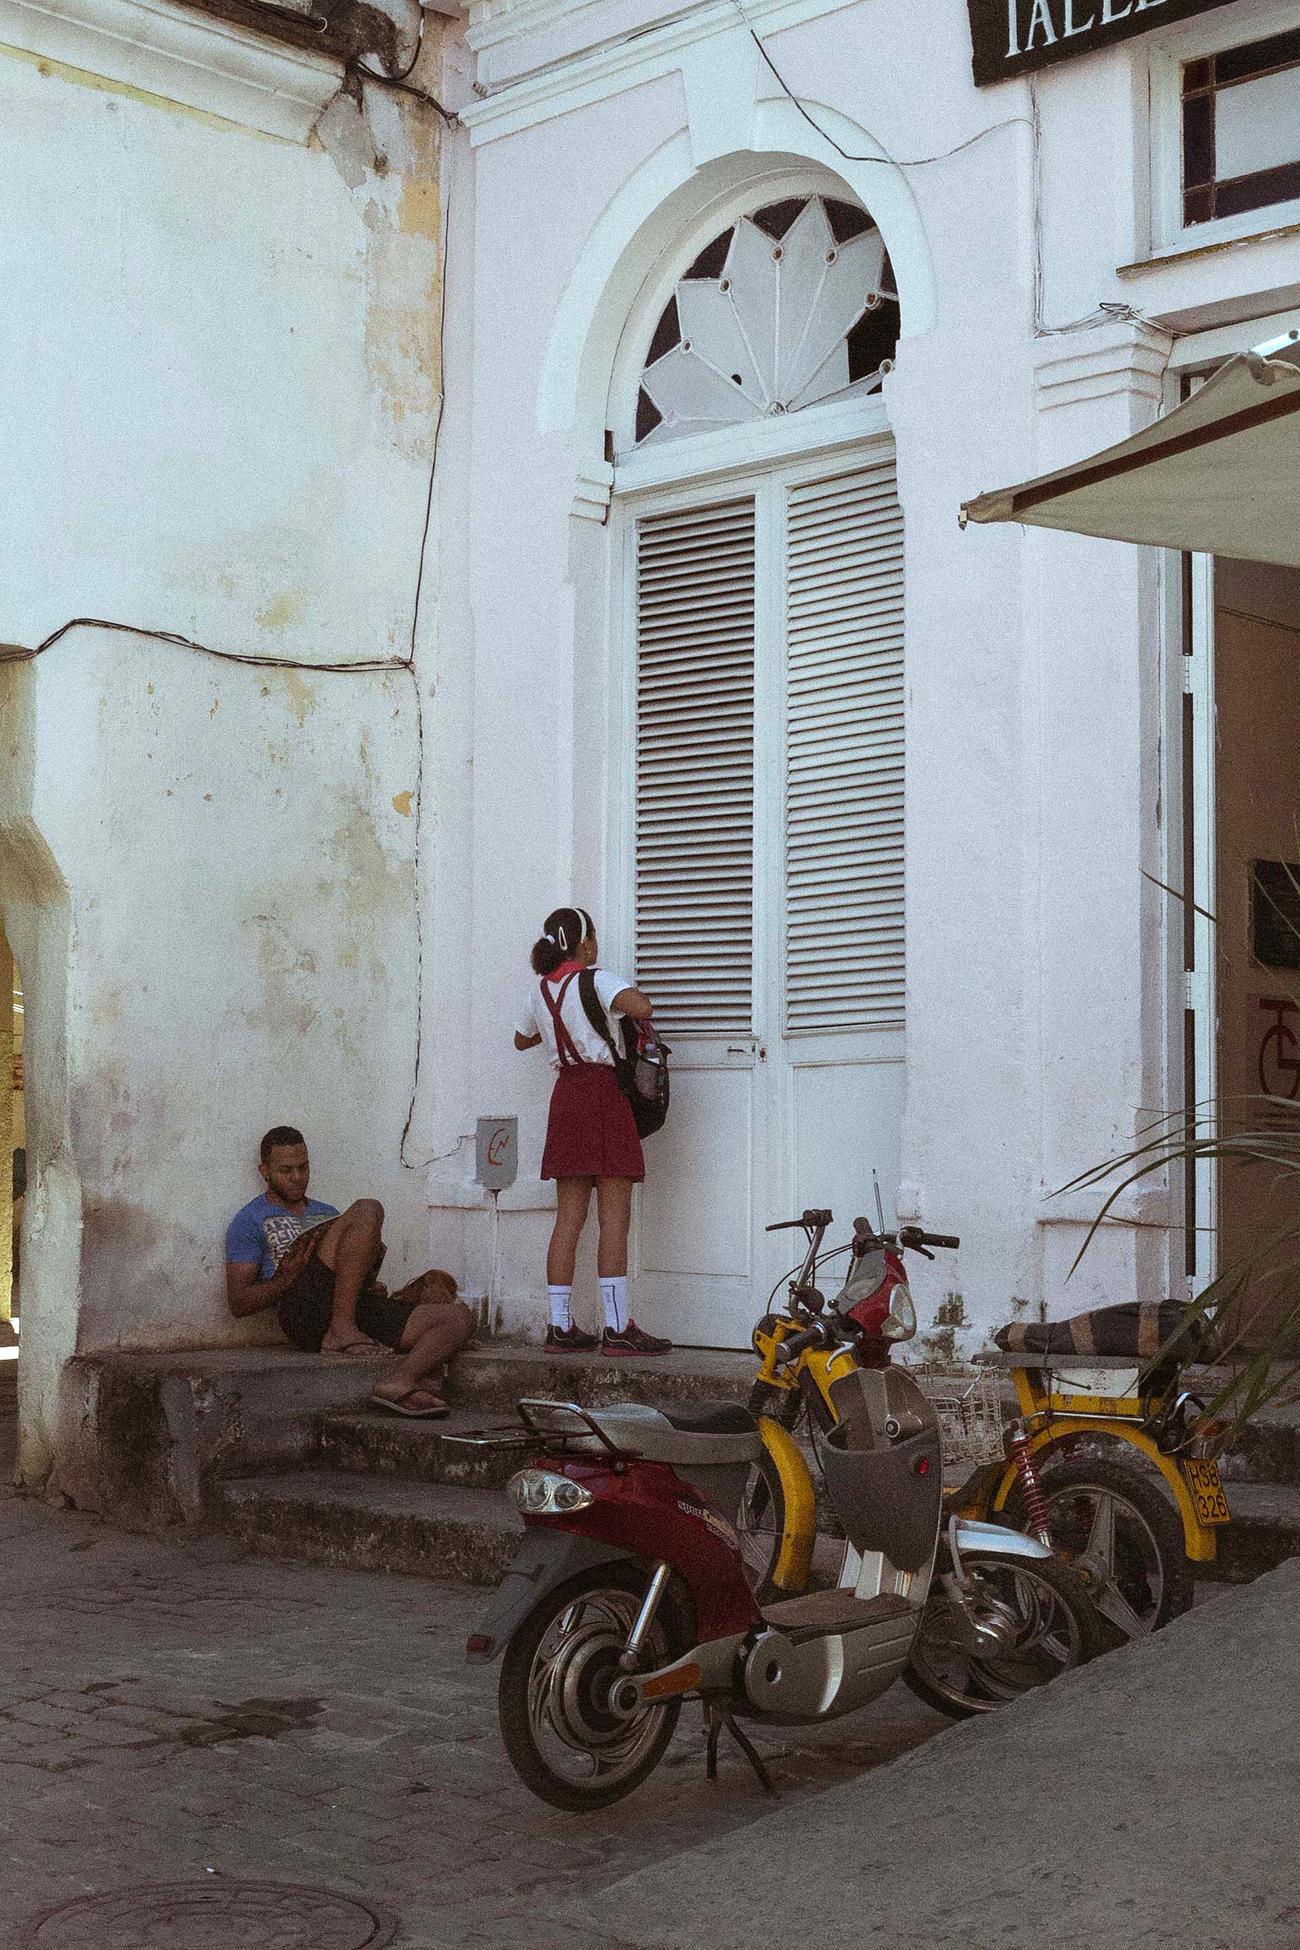 cuba_havana_felicidad_de_lucas_documentary_018.jpg